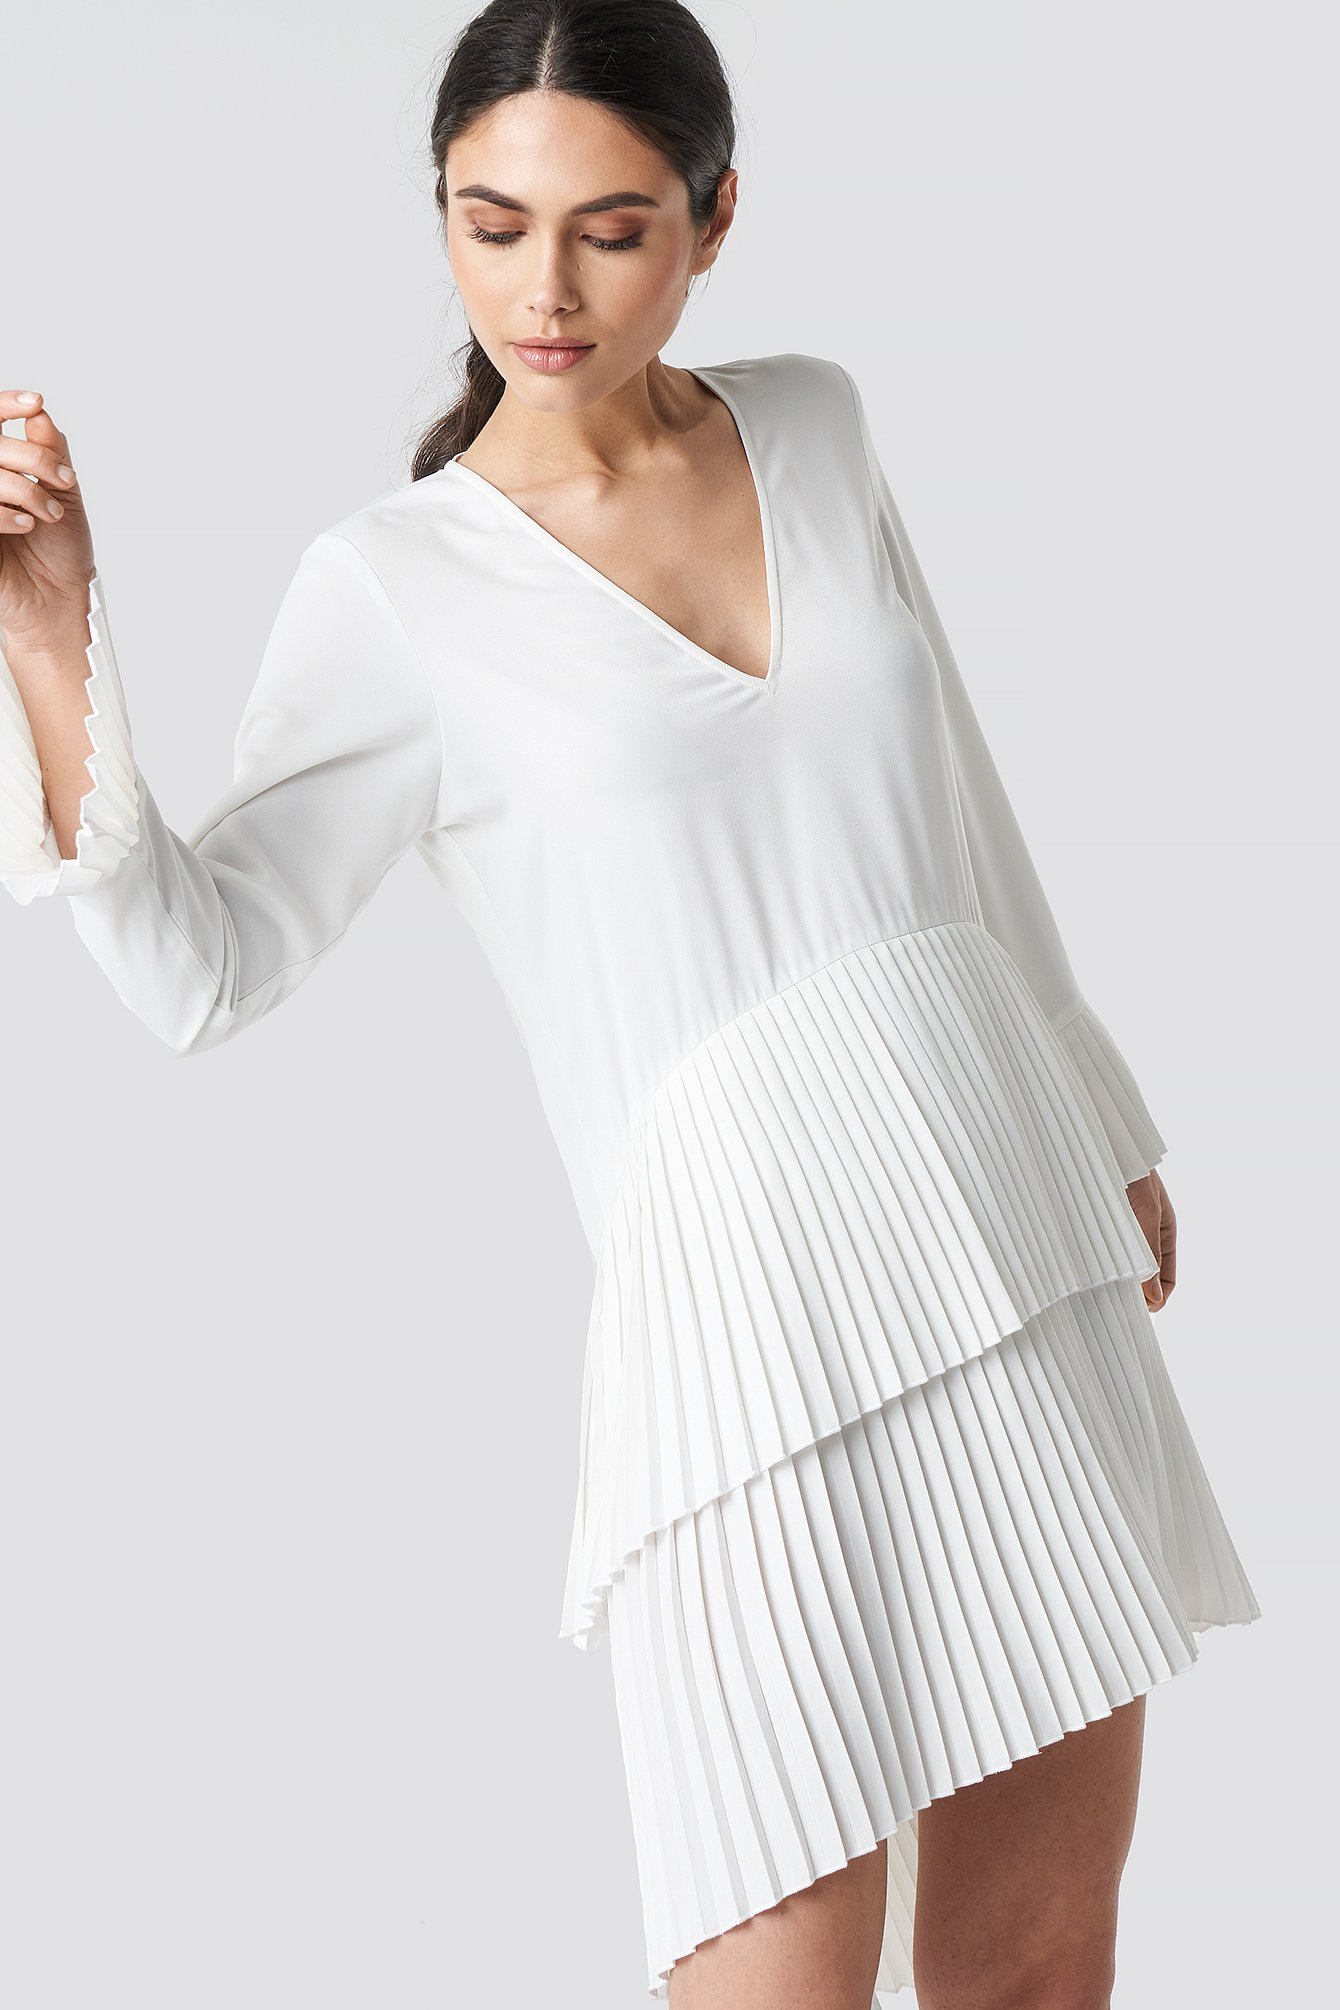 na-kd party -  Pleat Detail Layered Mini Dress - White